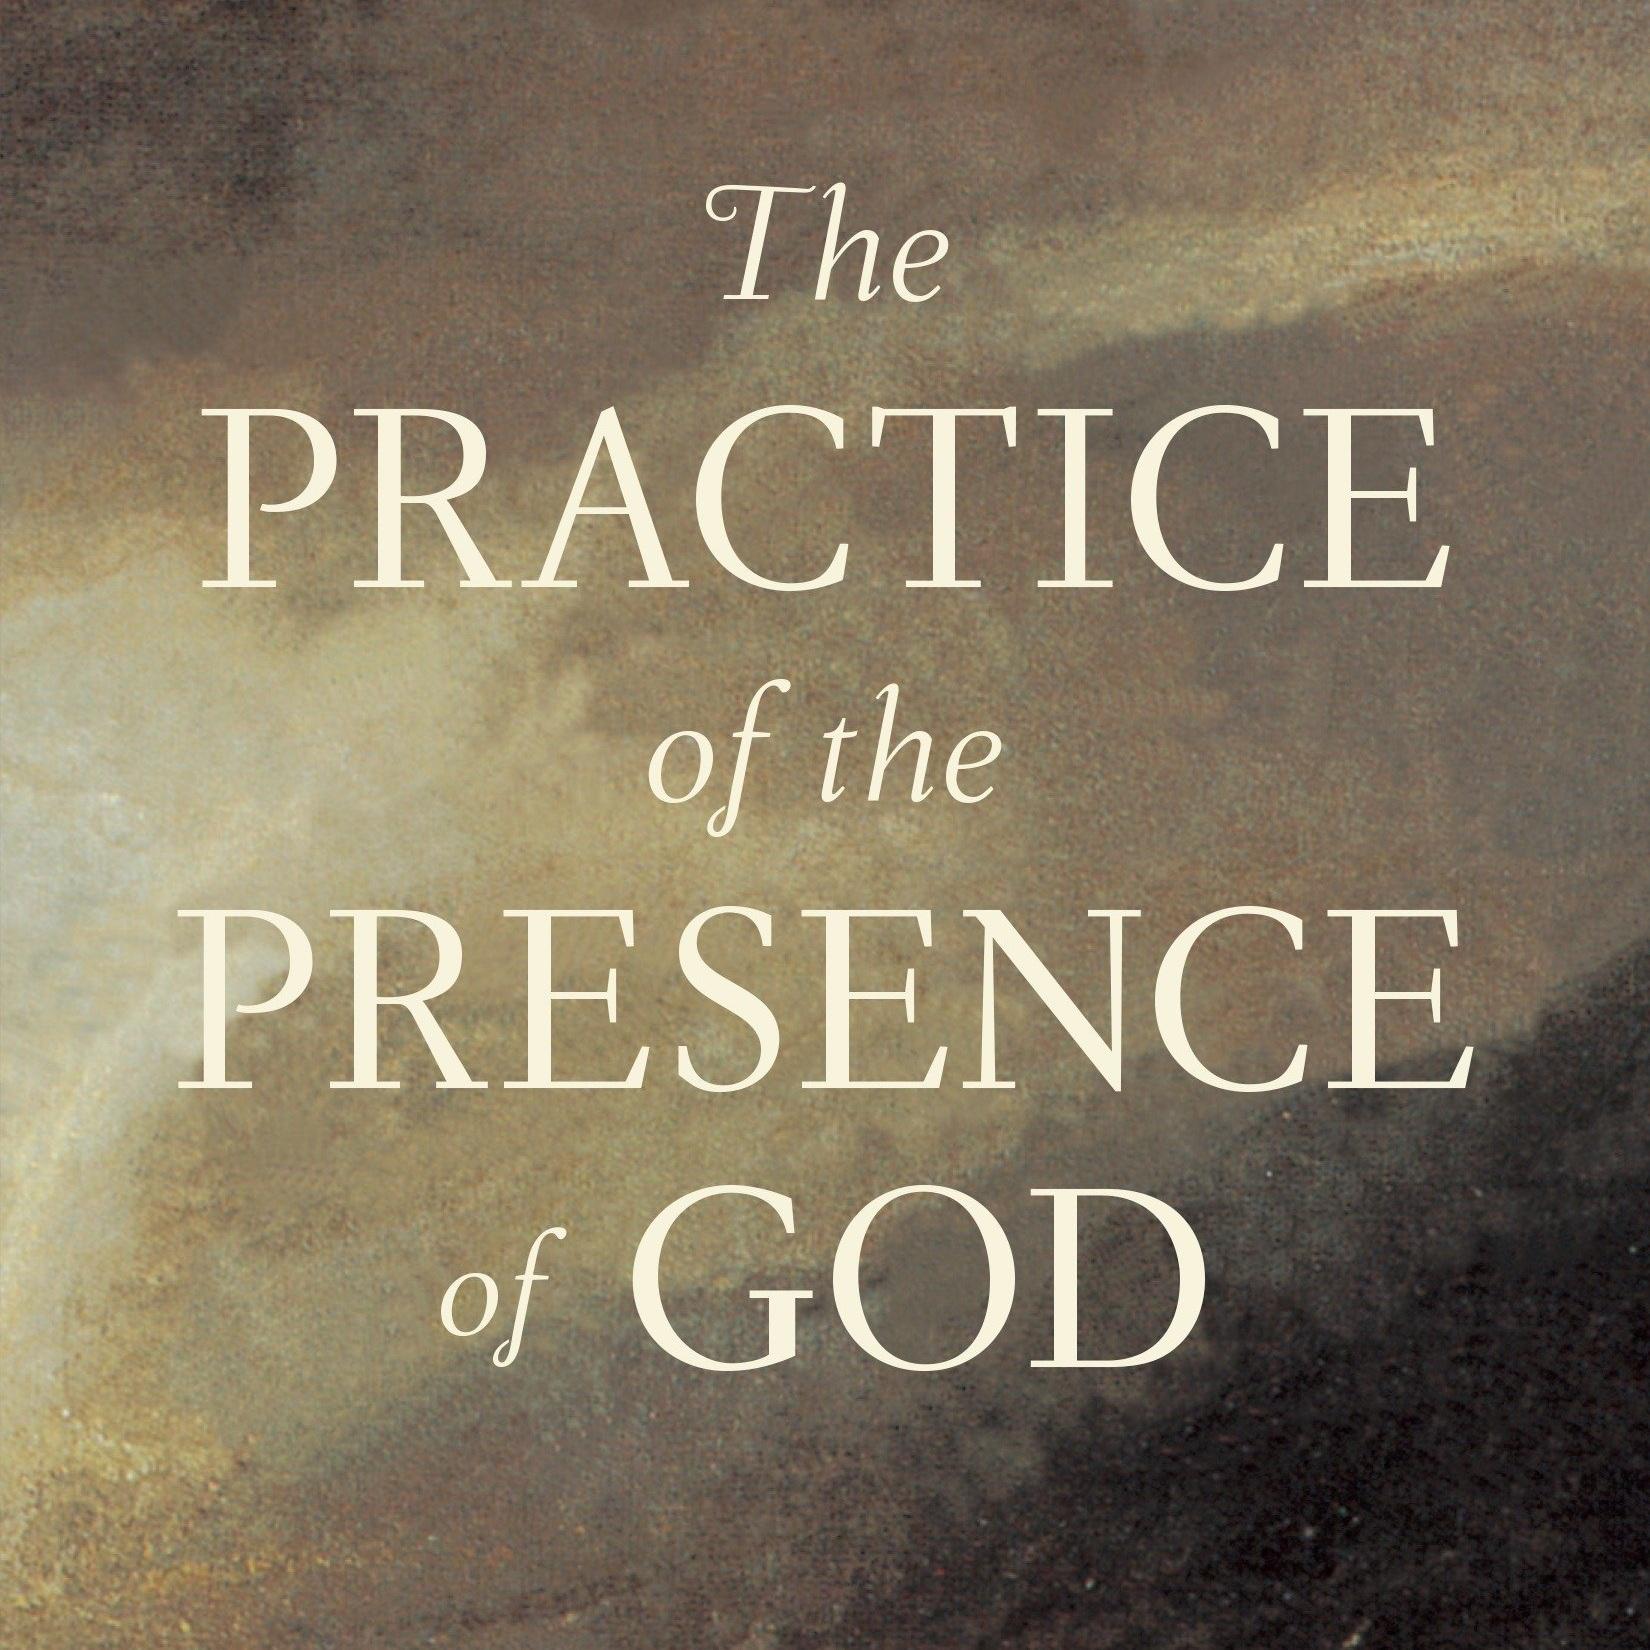 practice+of+the+presence.jpg